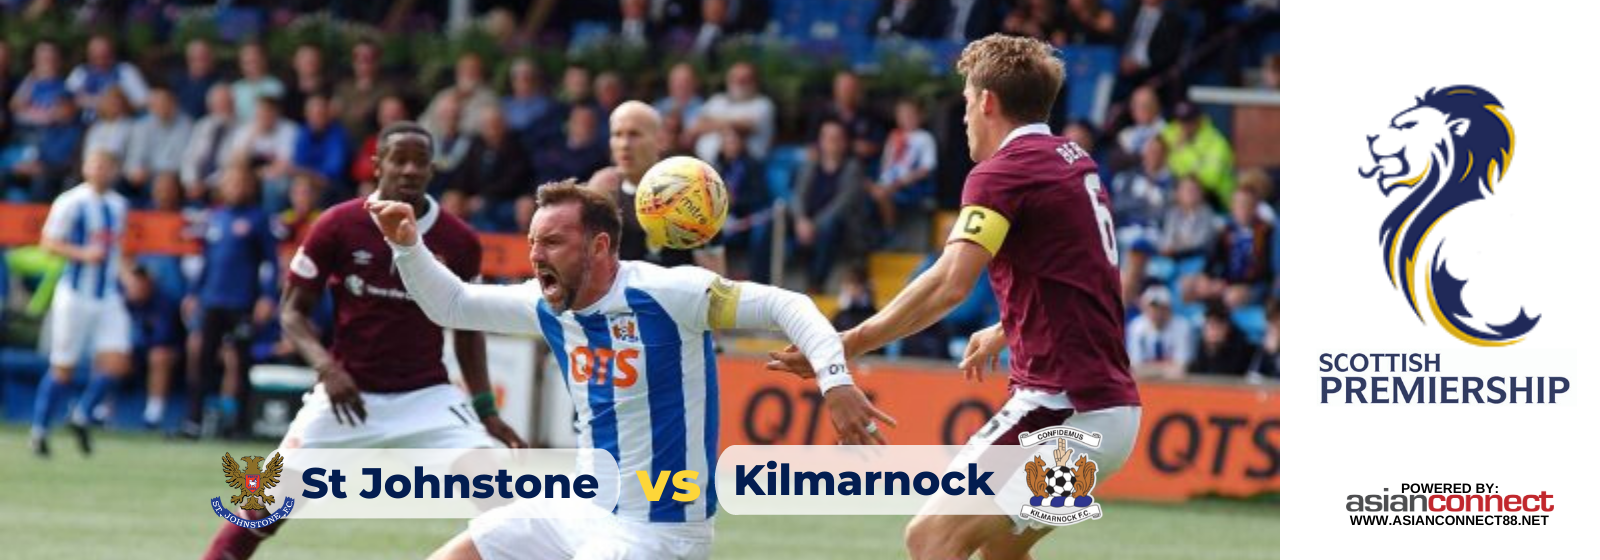 Asianconnect: St Johnstone vs Kilmarnock Odds for January 25, 2020